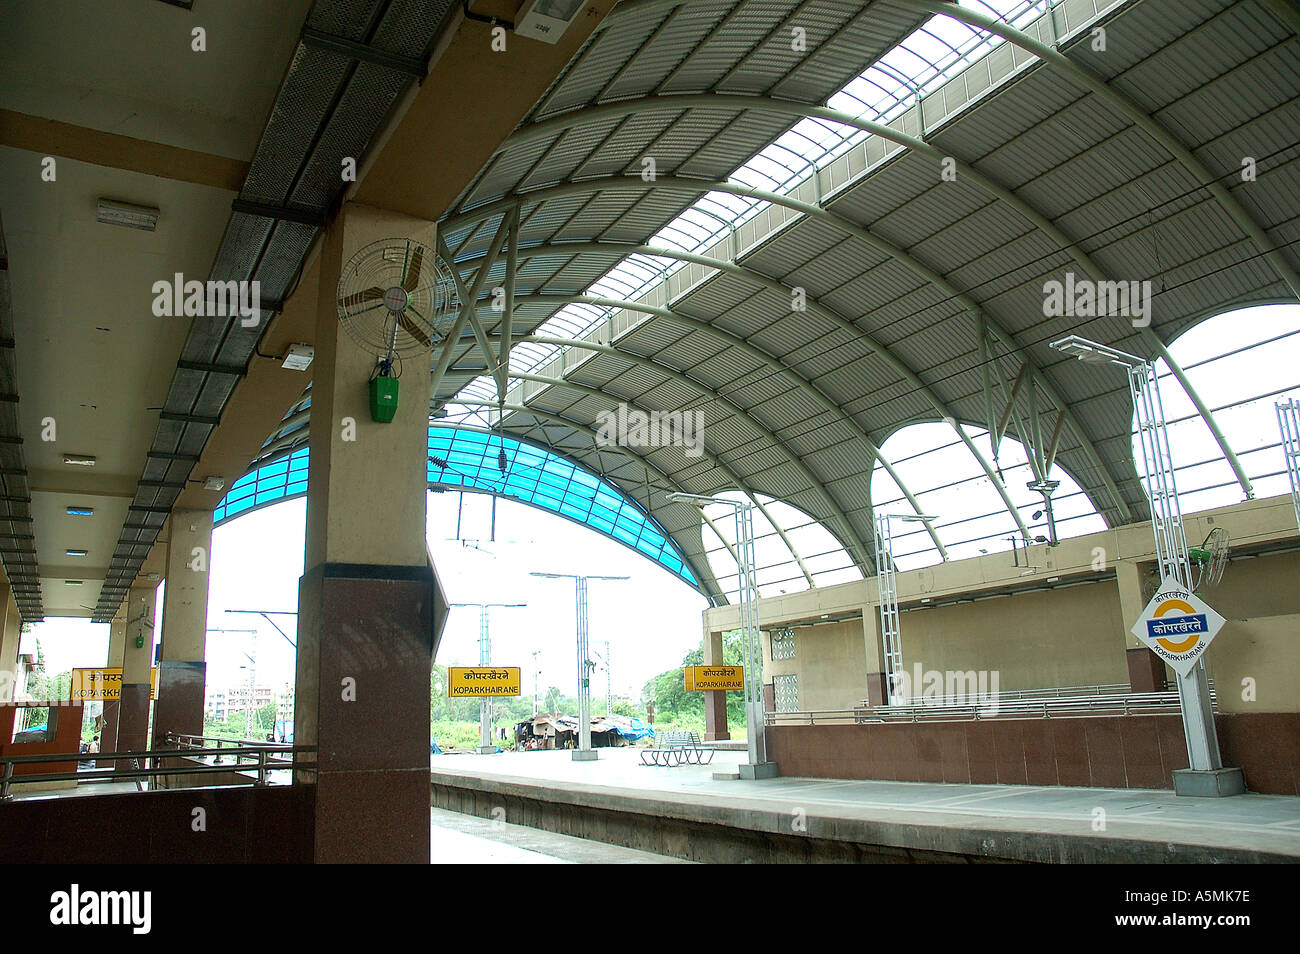 RAJ98892 moderne neue Koper Khairne Railway Station Navi Mumbai Vashi Bombay Maharashtra, Indien Stockfoto